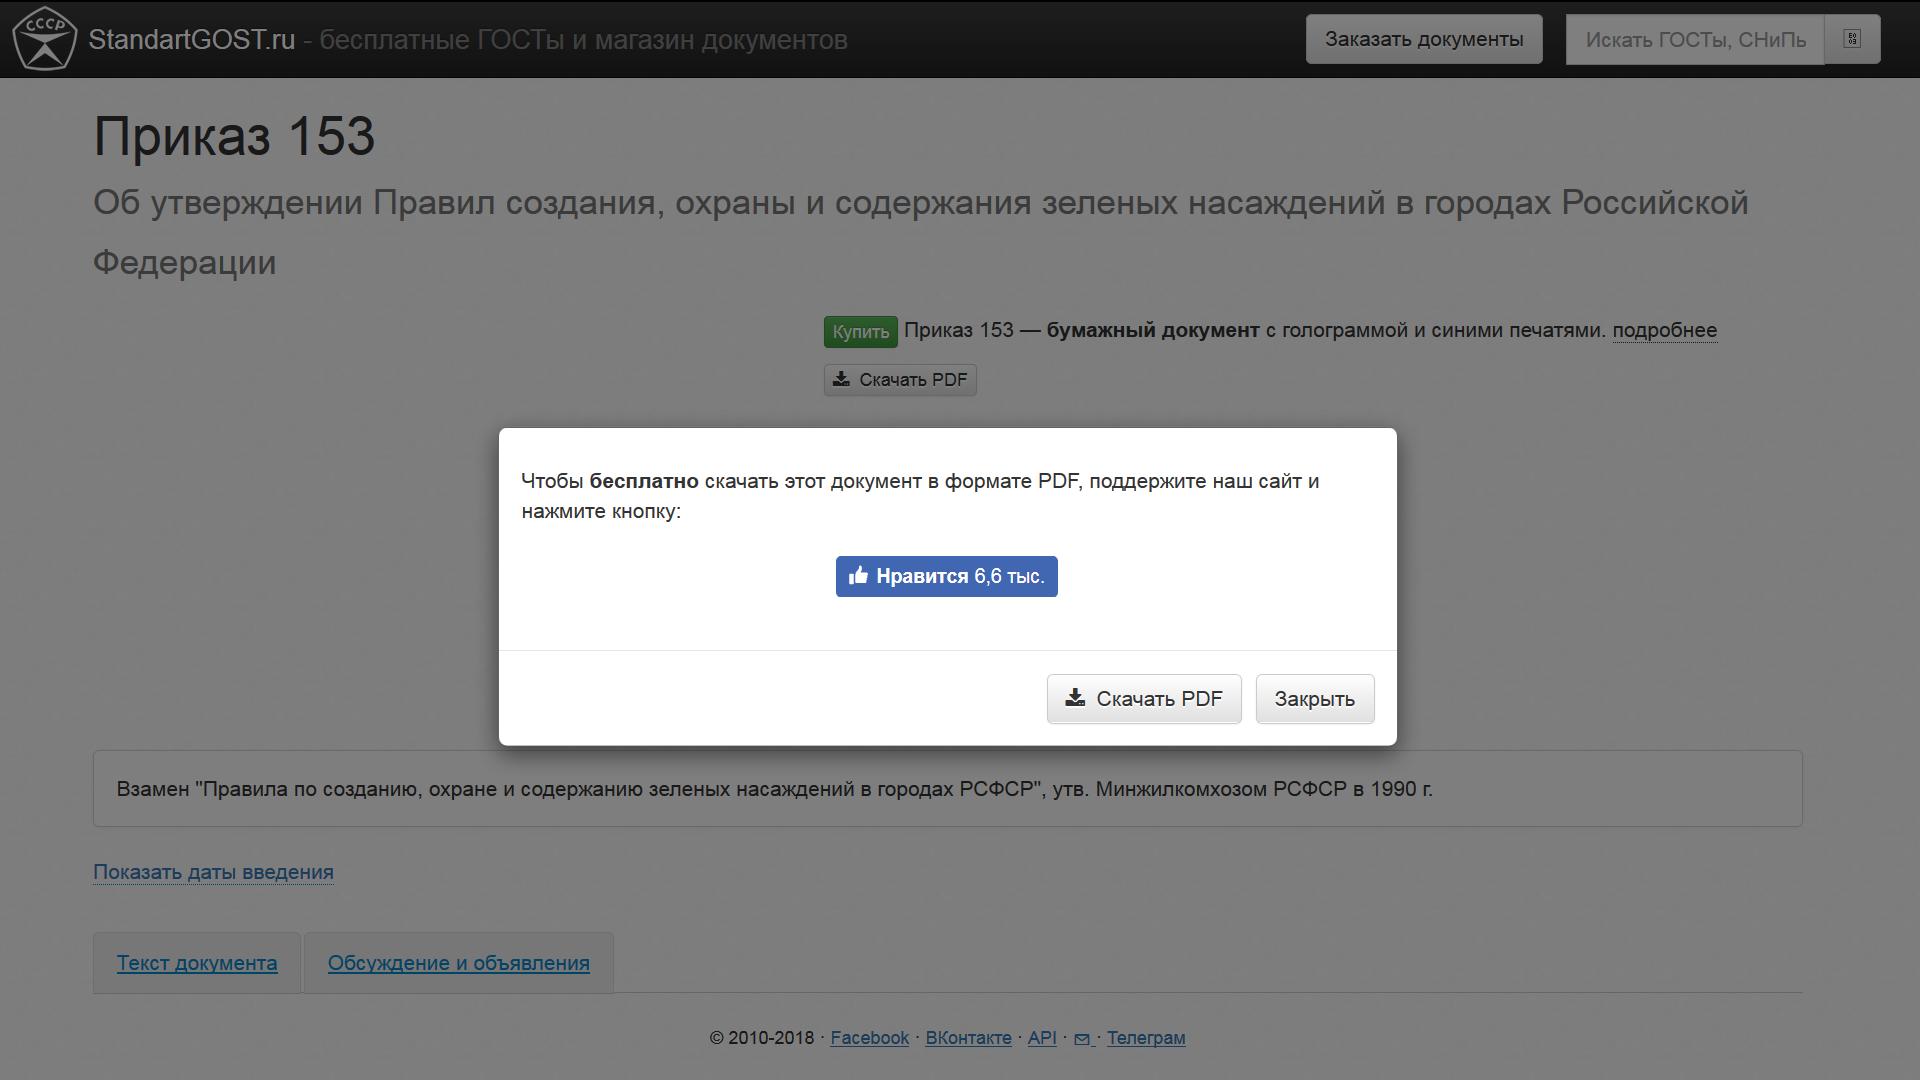 Пример страницы с сайта standartgost.ru